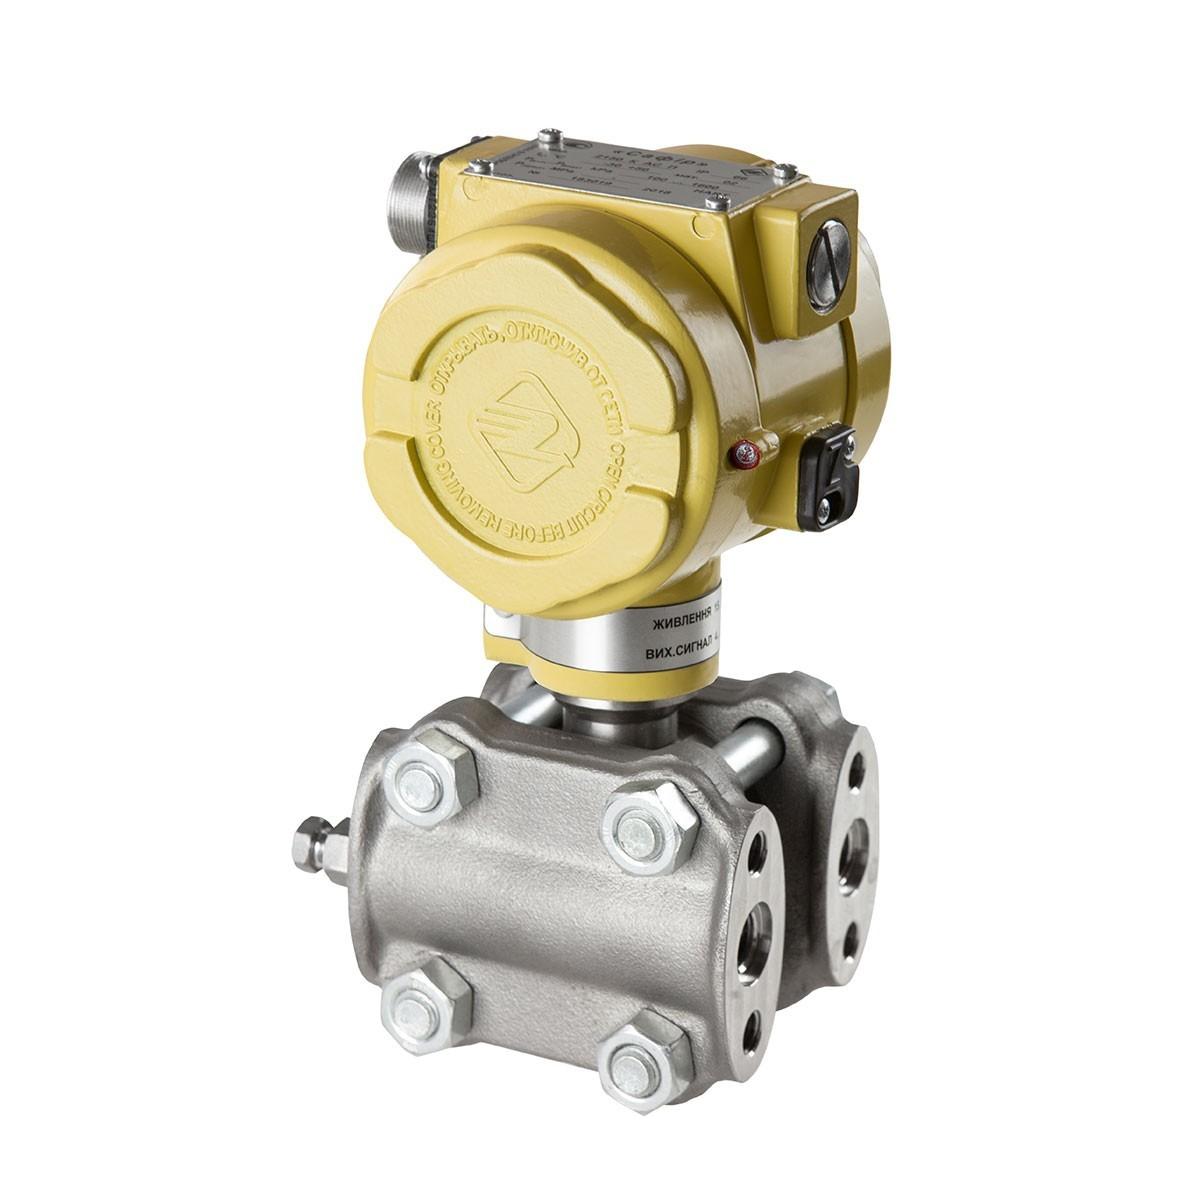 Analog Differential Pressure Transmitters Safir 2420, 2430, 2434, 2440, 2444, 2450, 2454